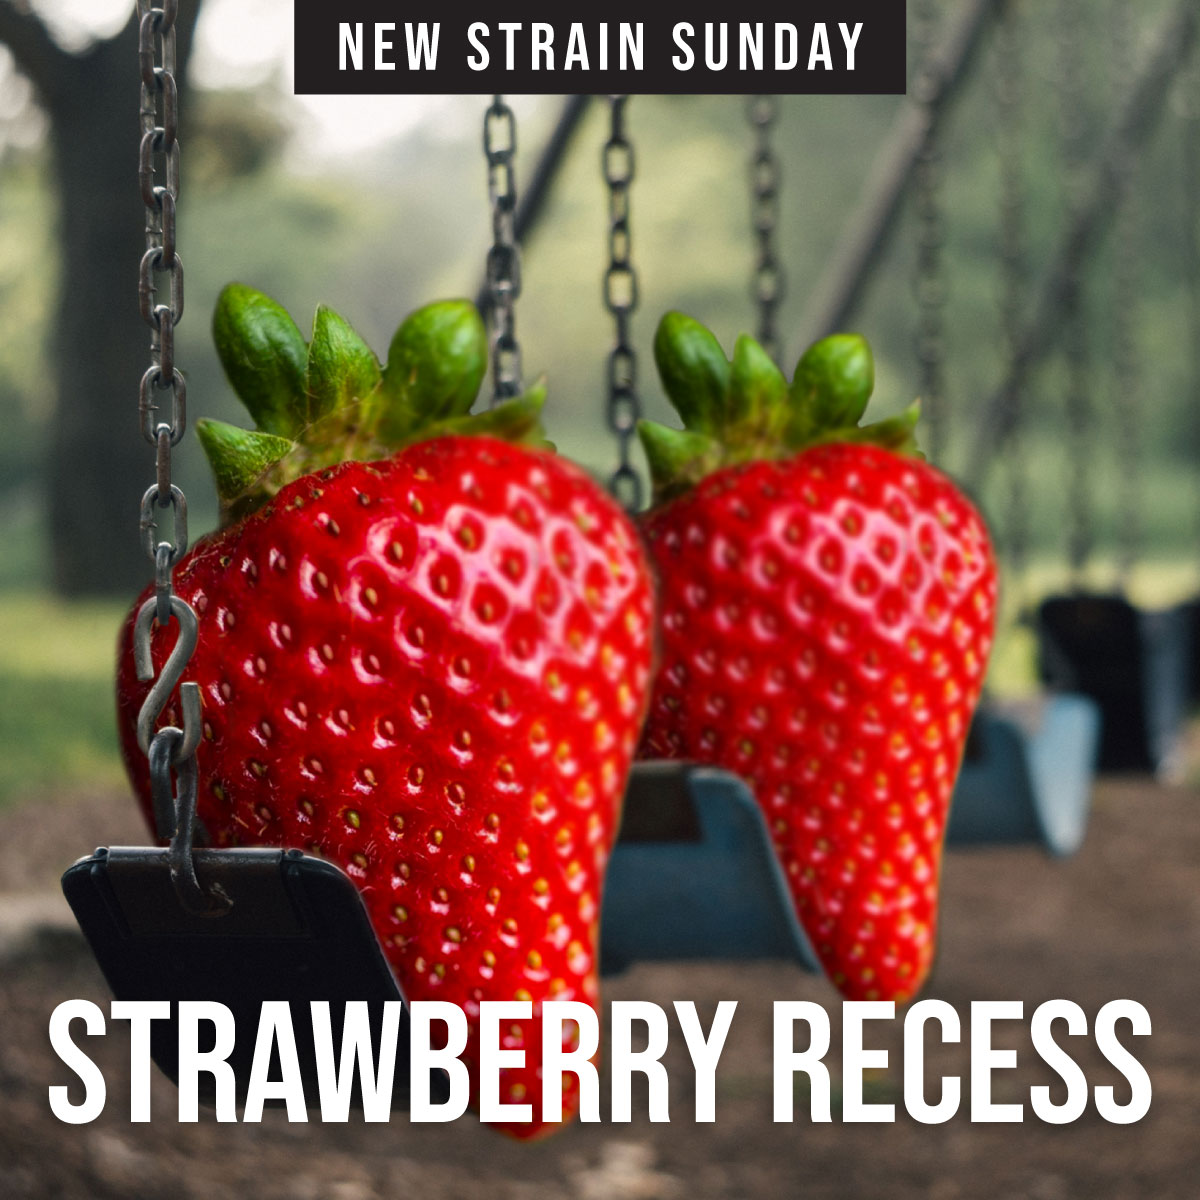 CCM-strawberry-recess.jpg